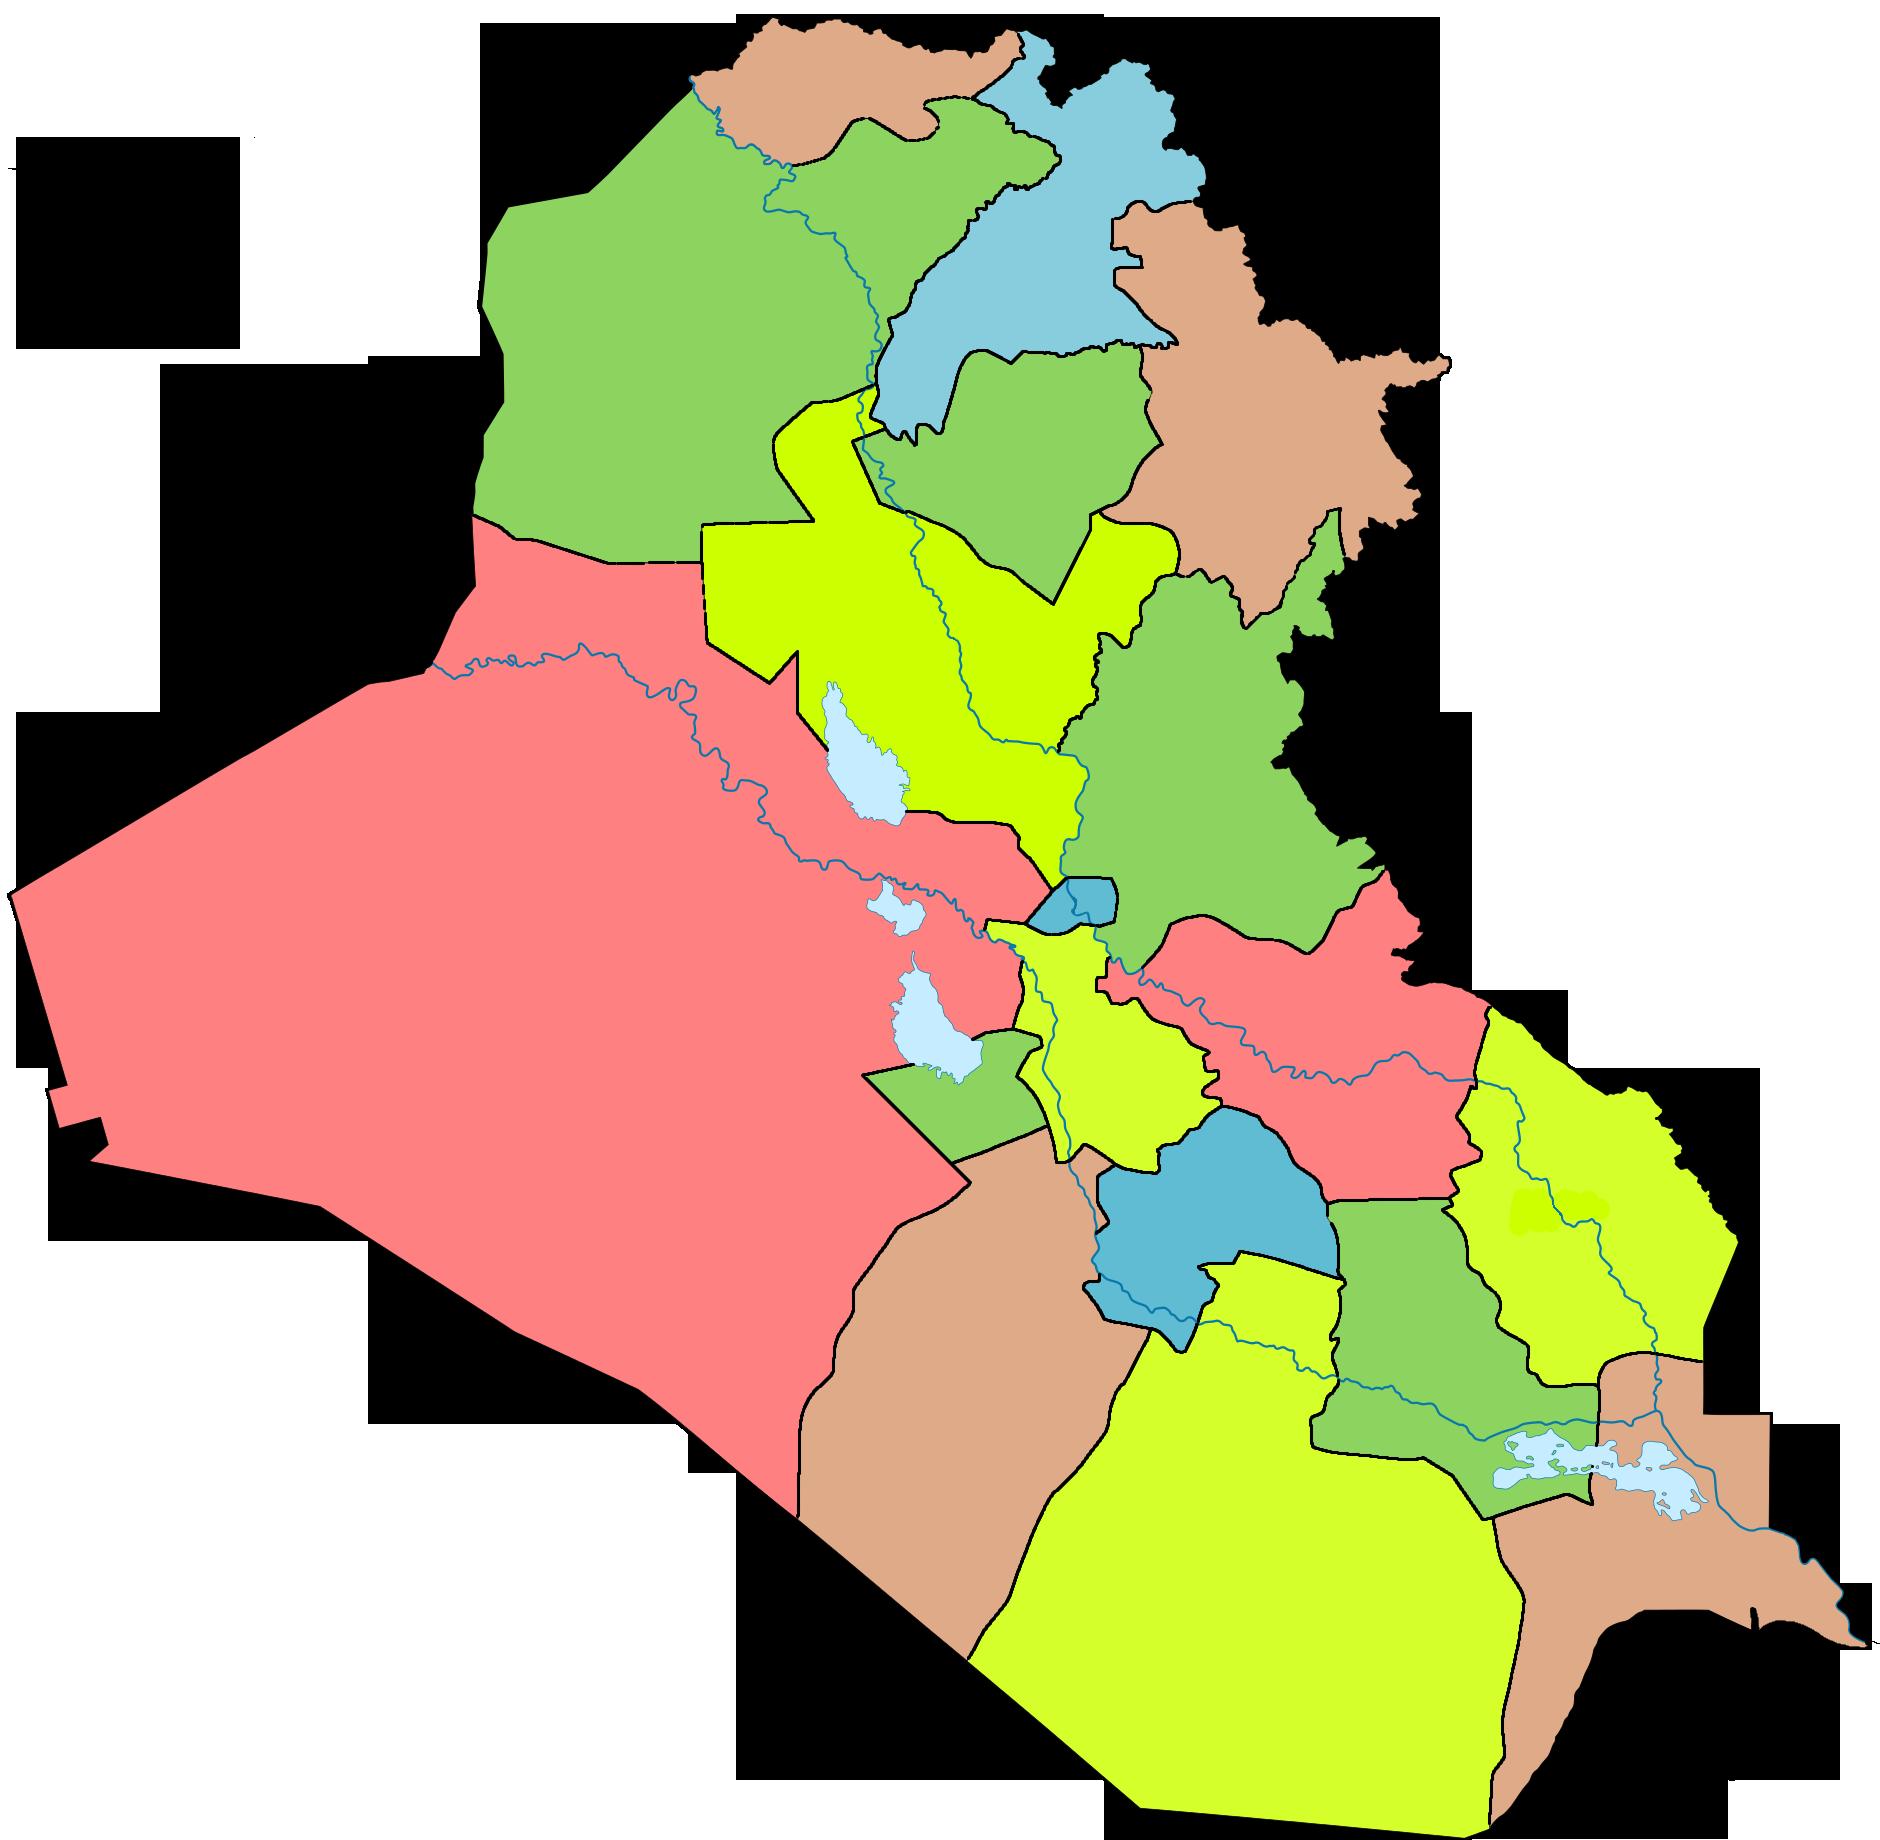 File:محافظات العراق.png